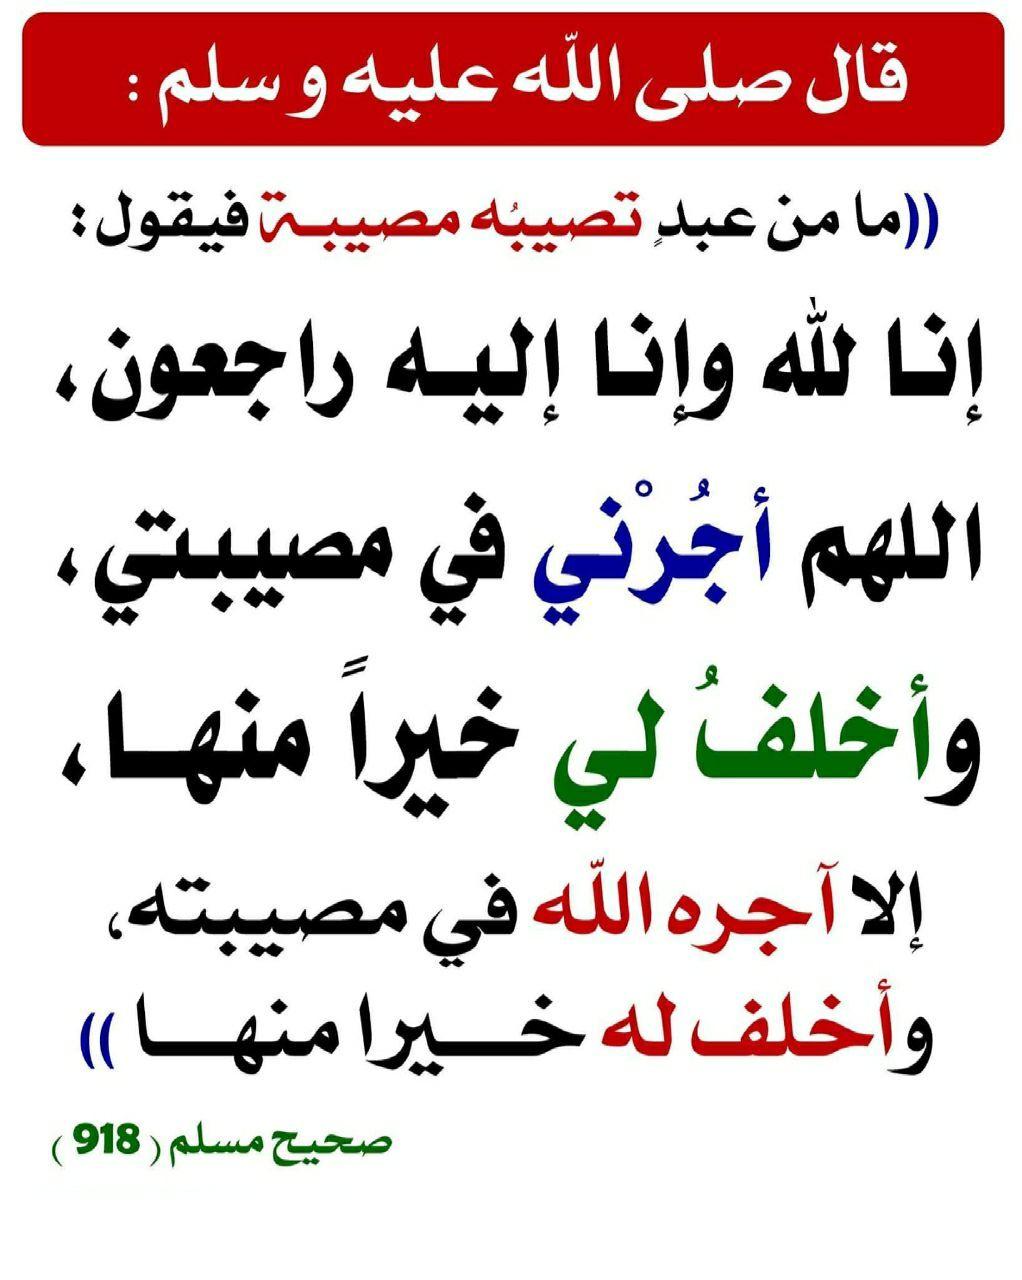 Pin By التفاح الأخضر التفاح الأخضر On أحاديث نبوية Islamic Quotes Cool Words Ahadith